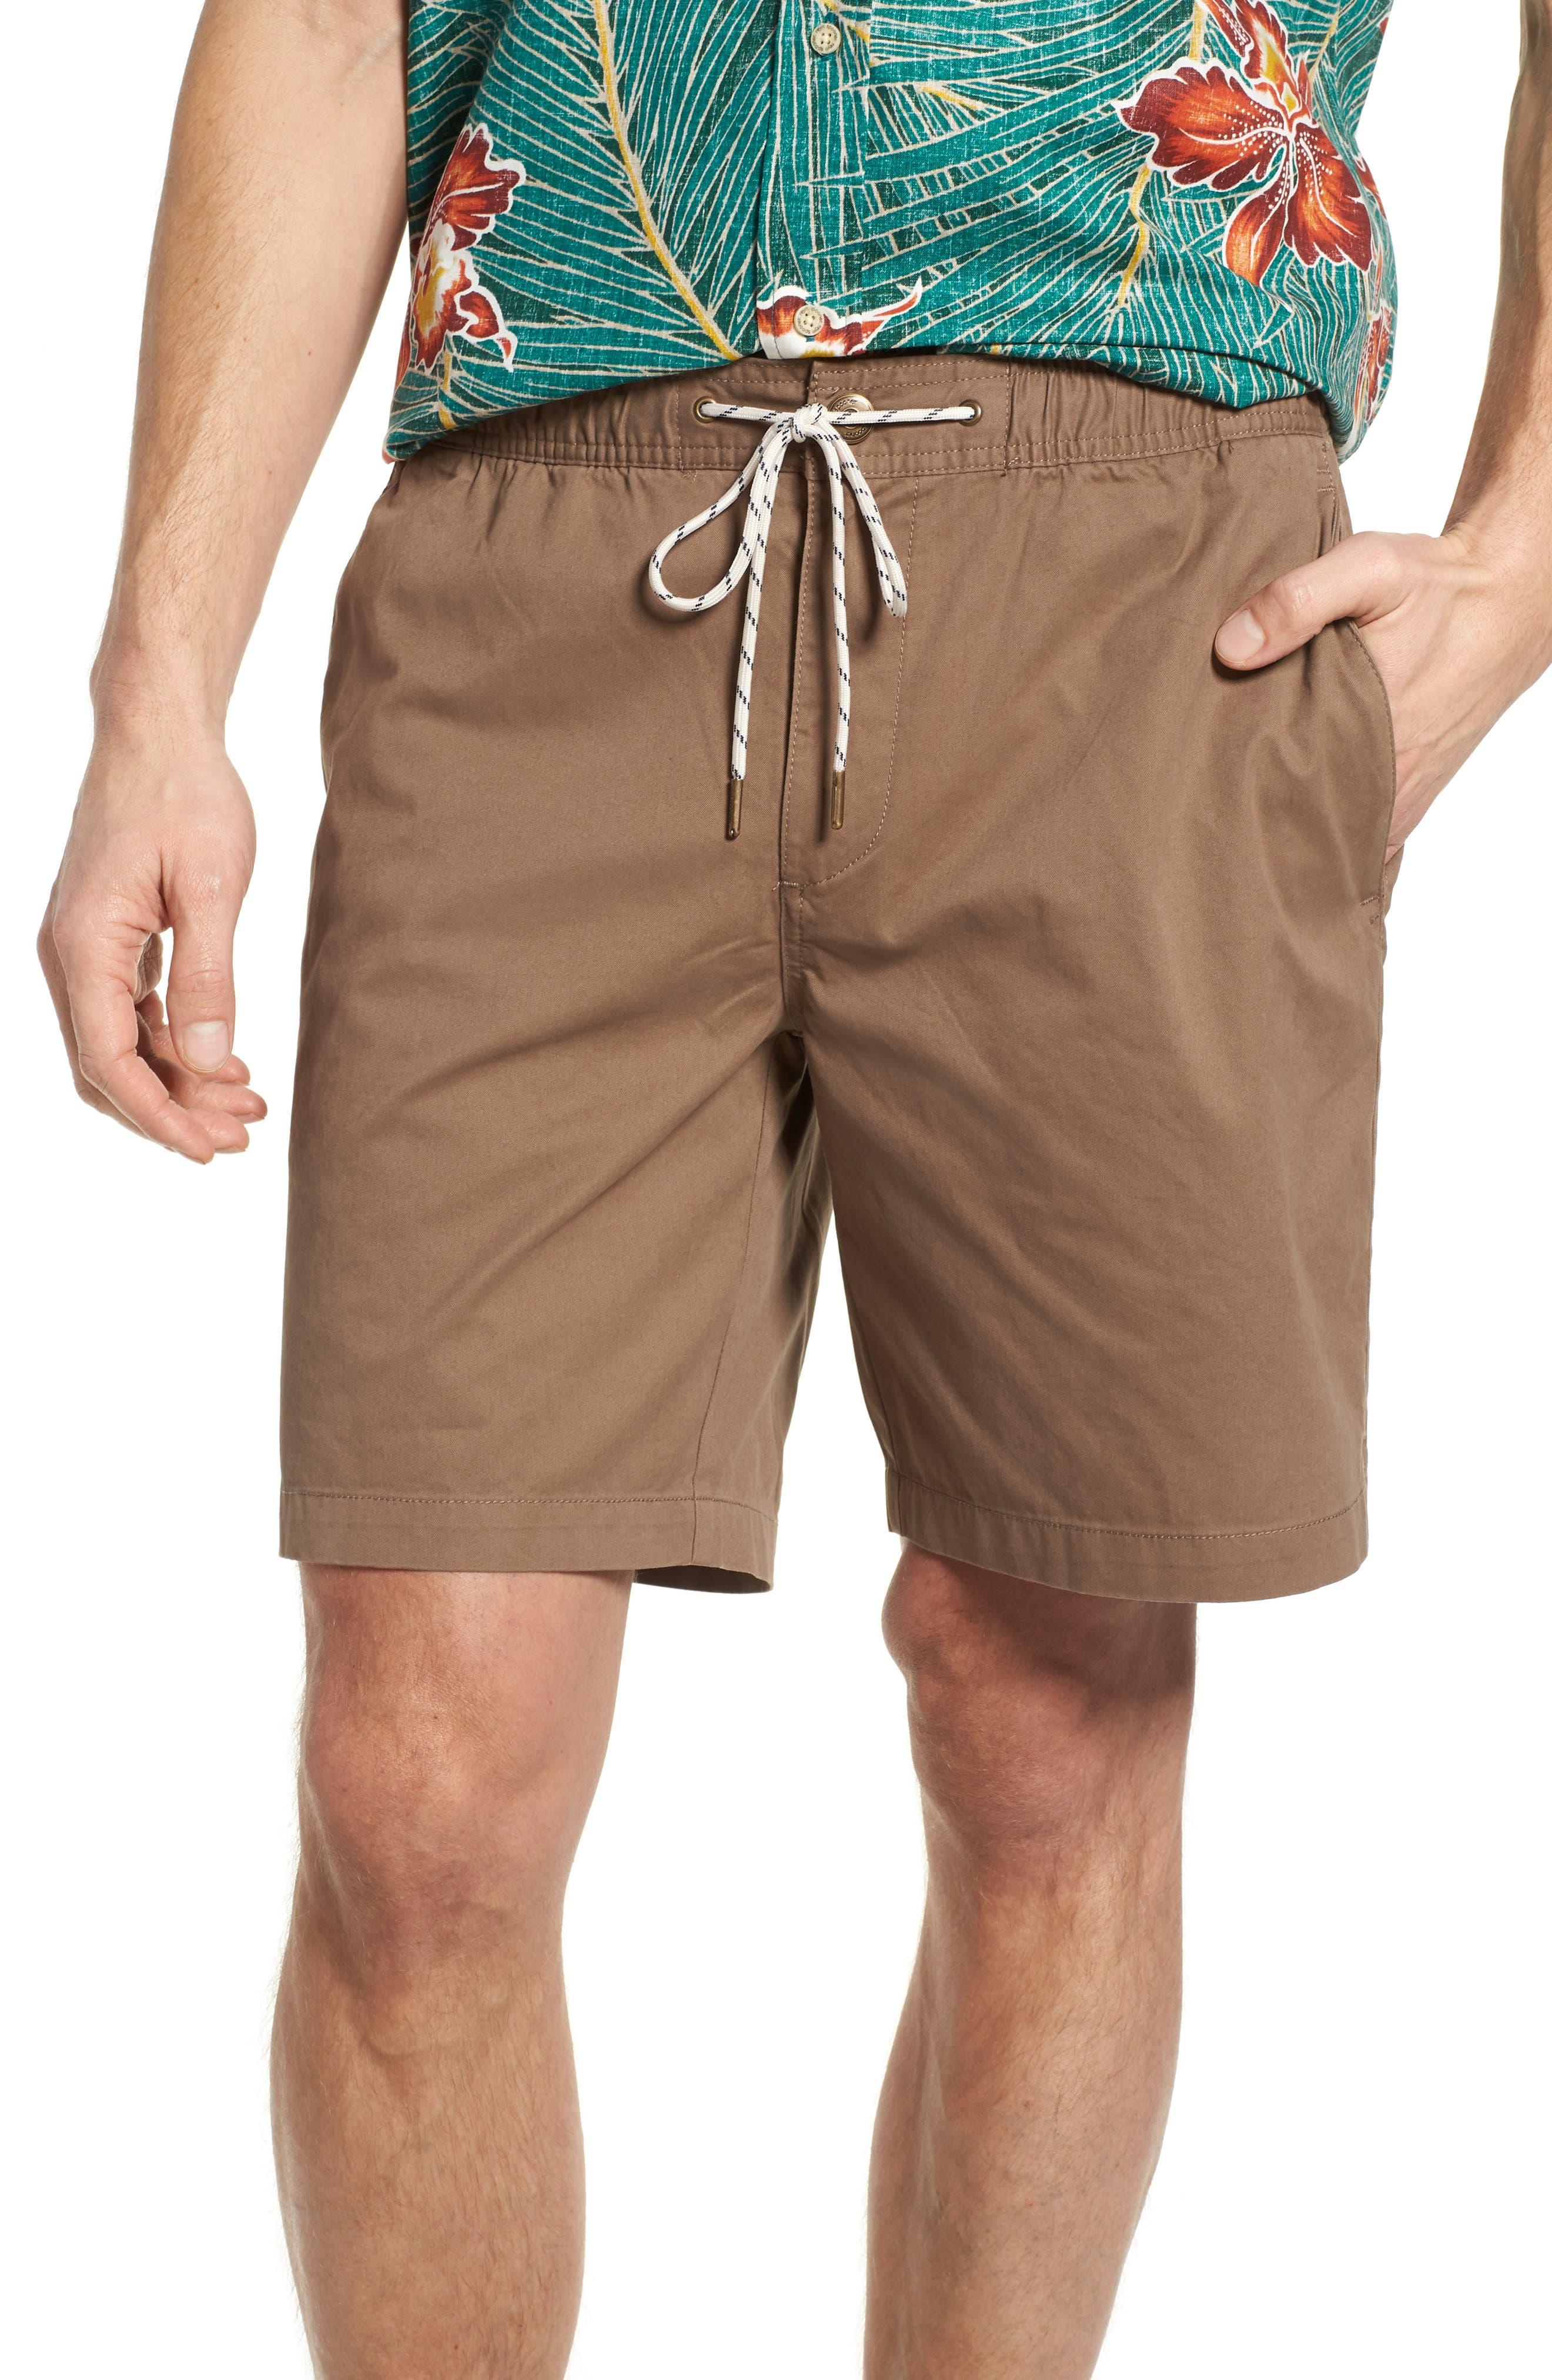 Reyn Spooner Beach Shorts